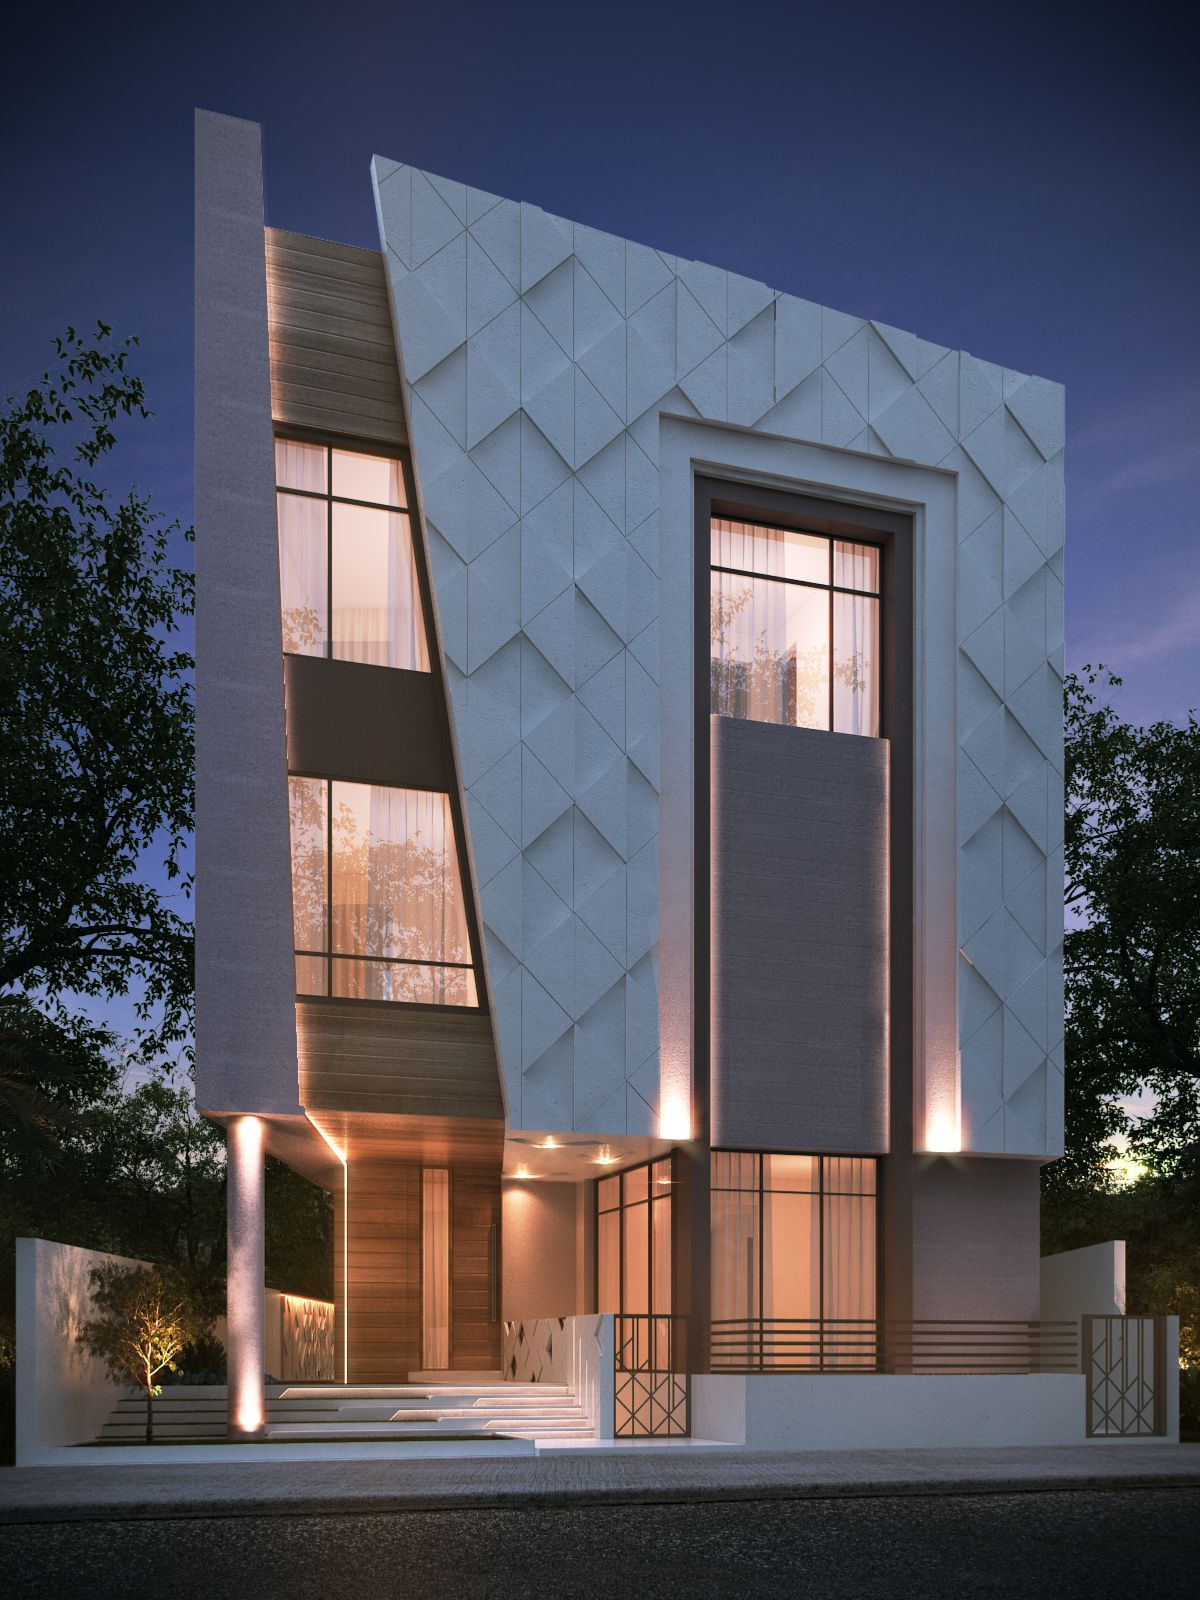 Private villa 400 m kuwait by sarah sadeq architects for Private villa design